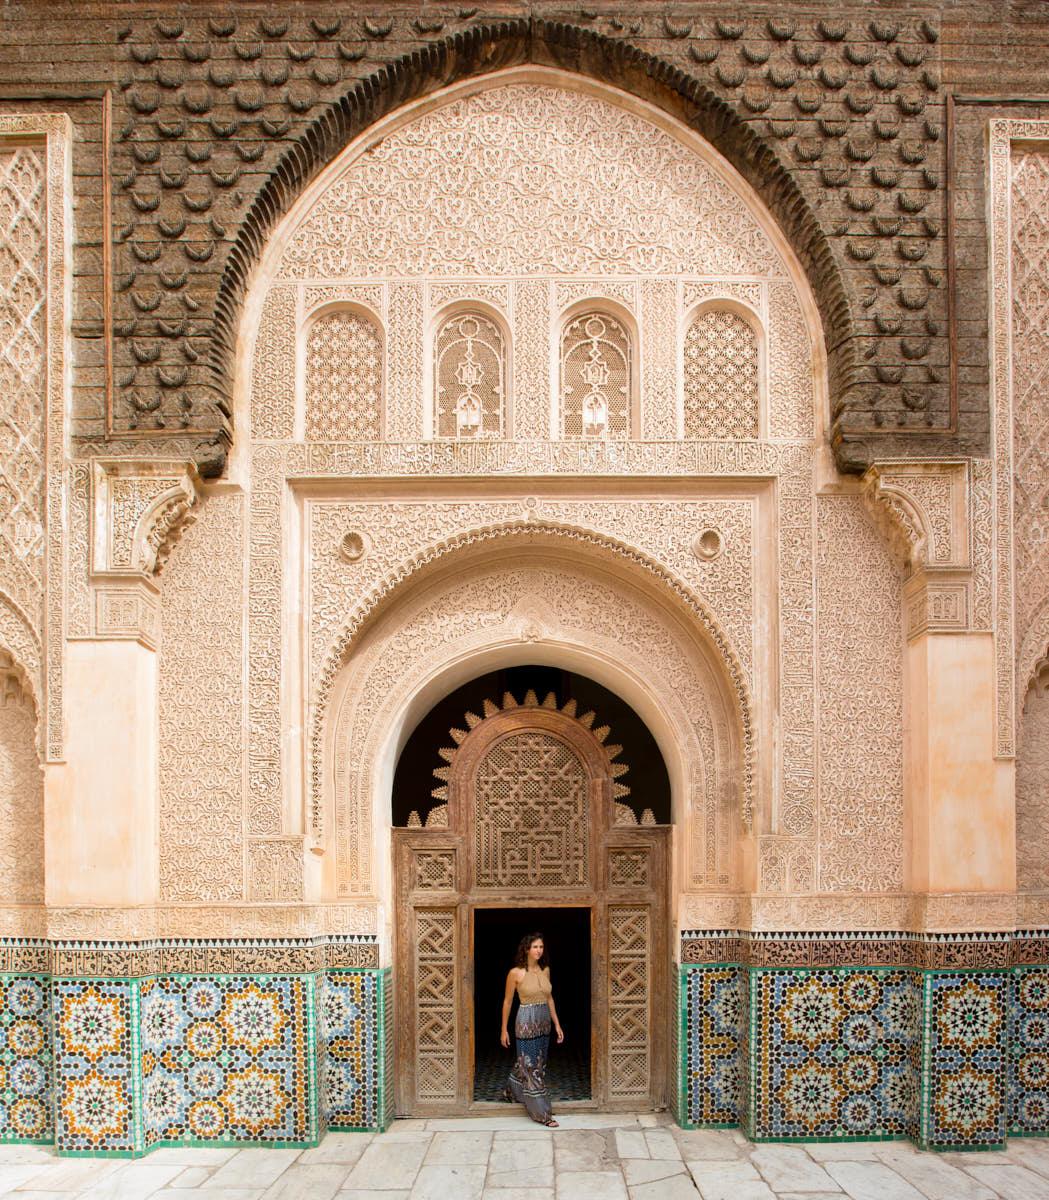 Madersa_Ben_Youssef_Marrakech_Architecture